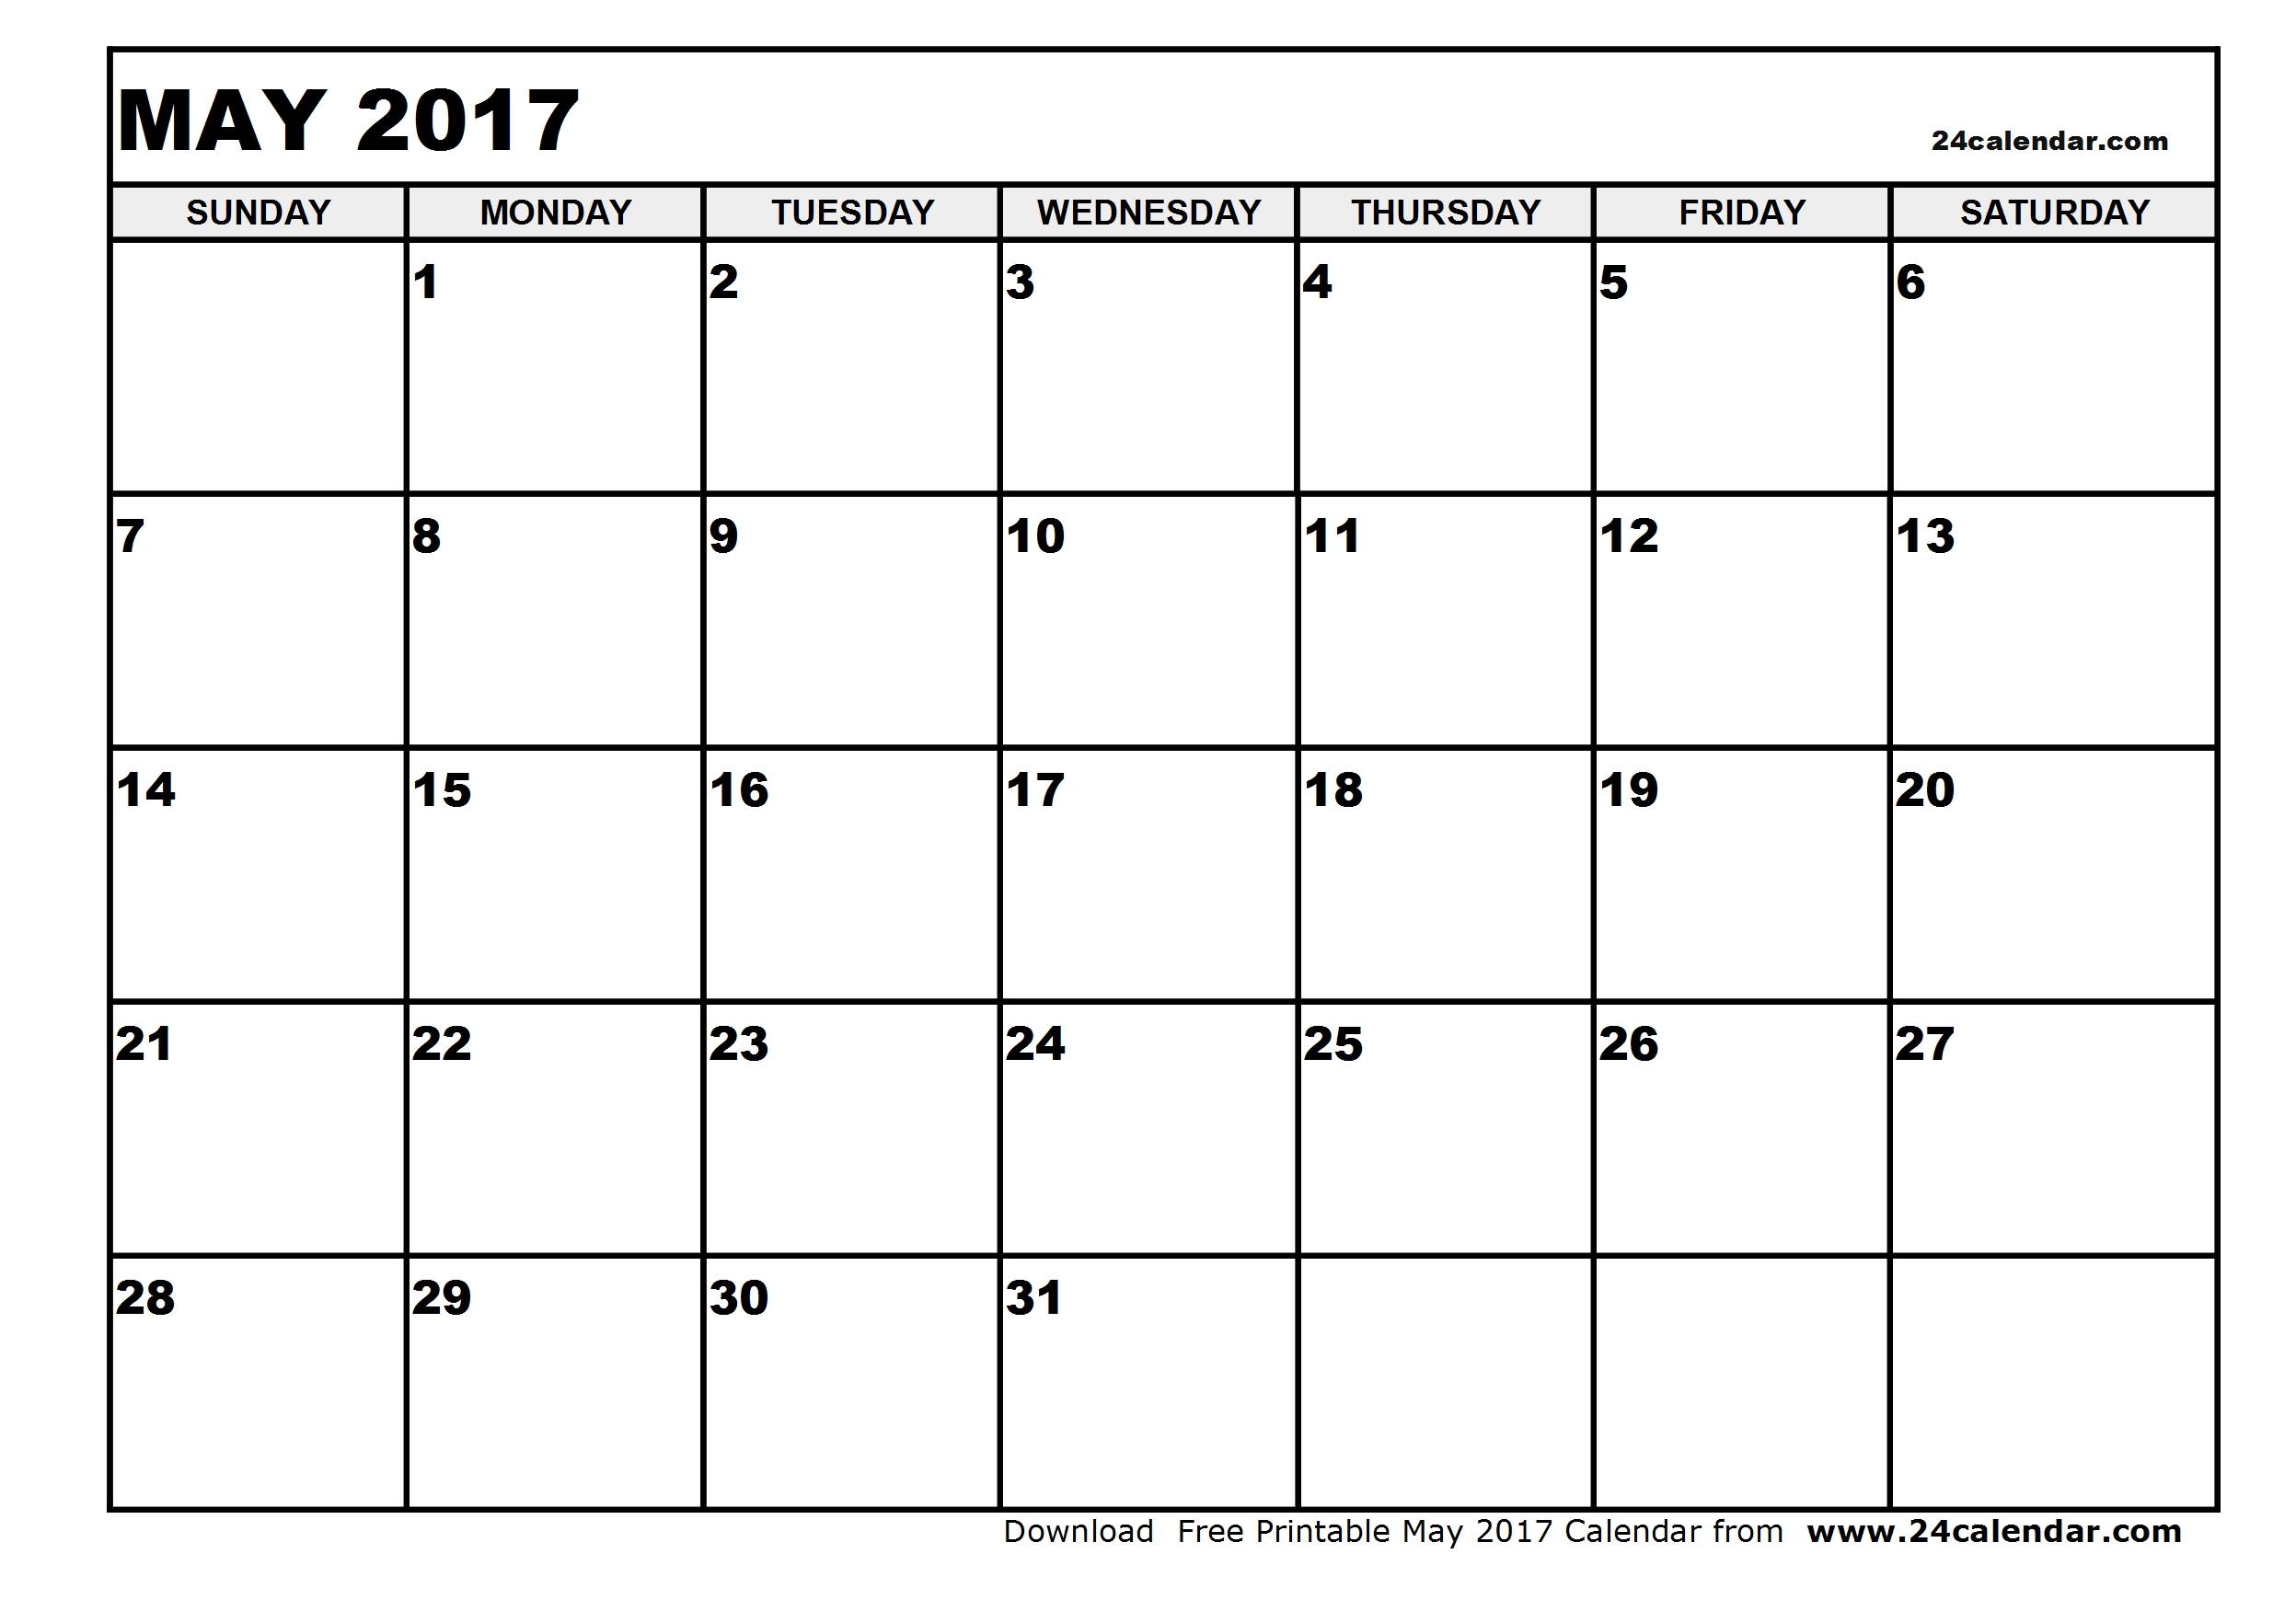 May 2017 Calendar Pdf | weekly calendar template